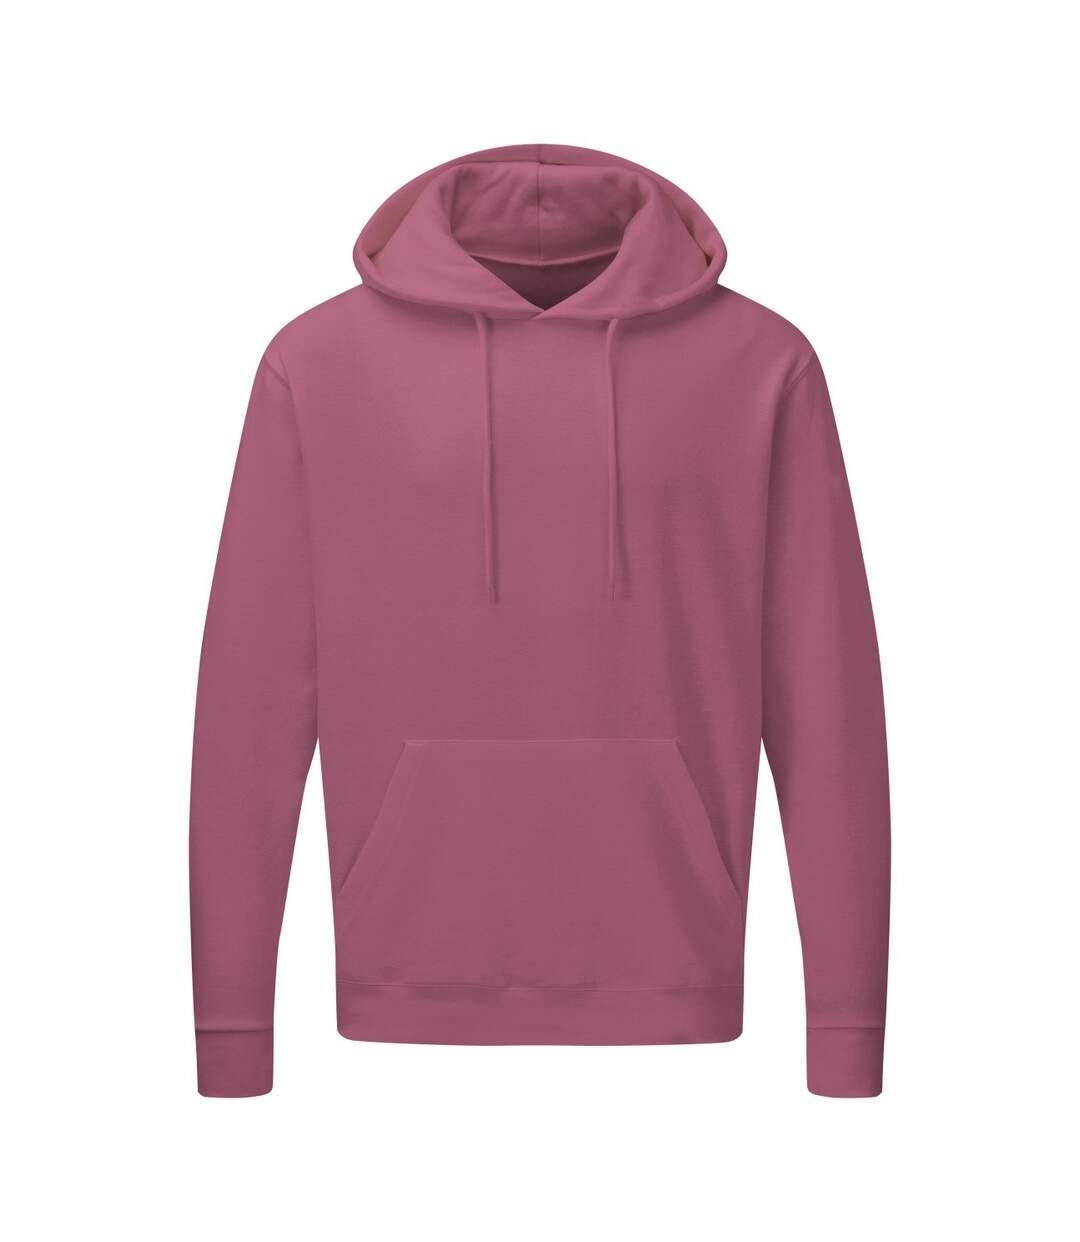 SG Mens Plain Hooded Sweatshirt Top / Hoodie (Cantaloupe) - UTBC1072